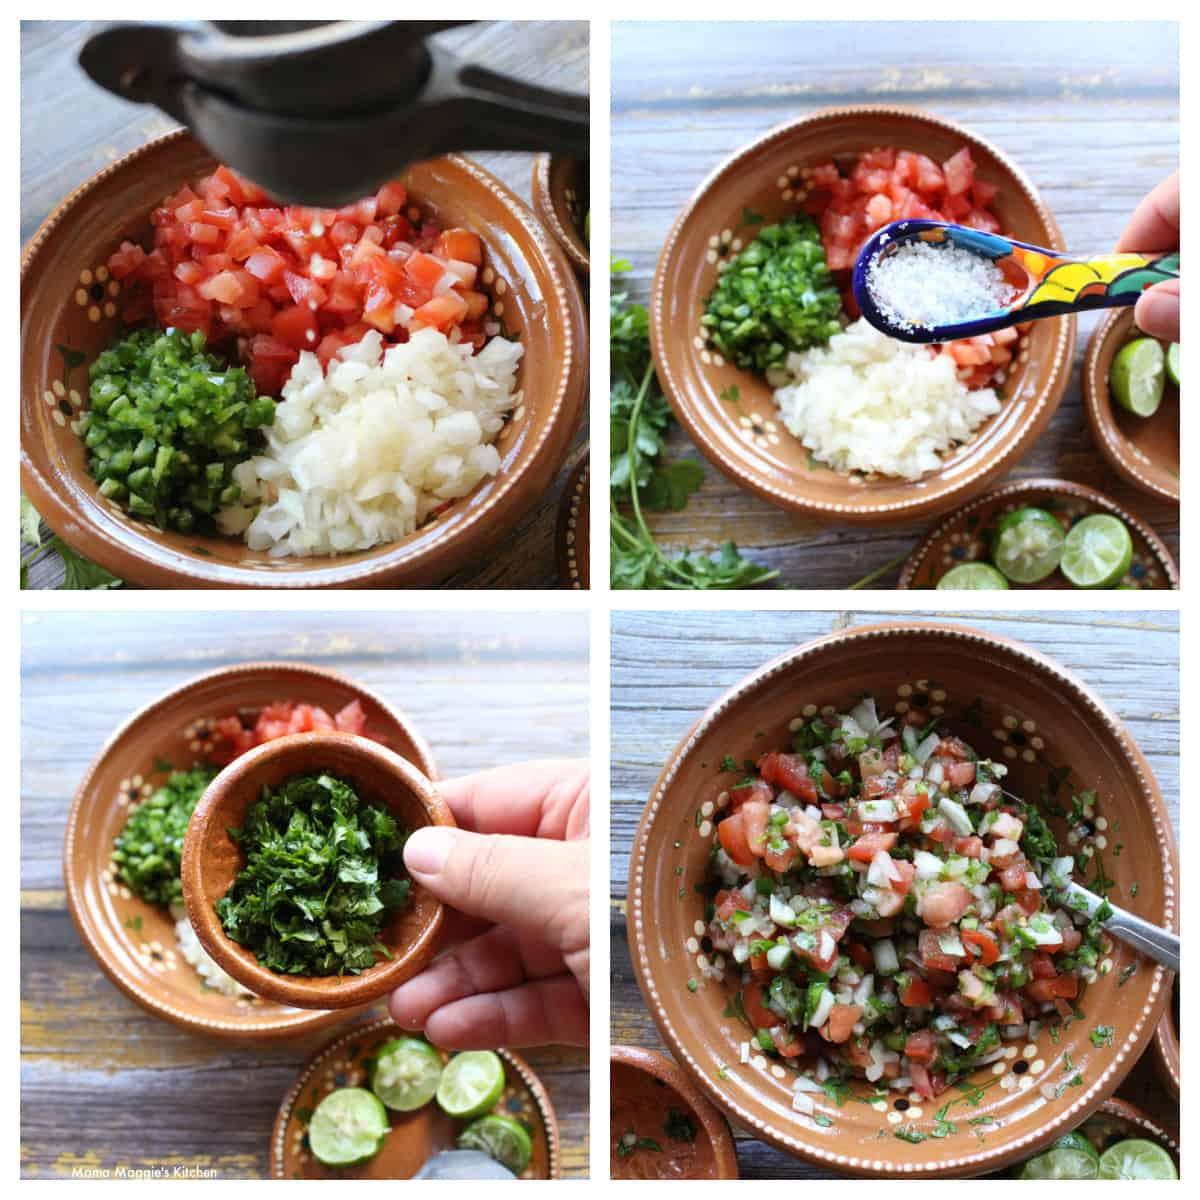 A collage showing how to make pico de gallo.